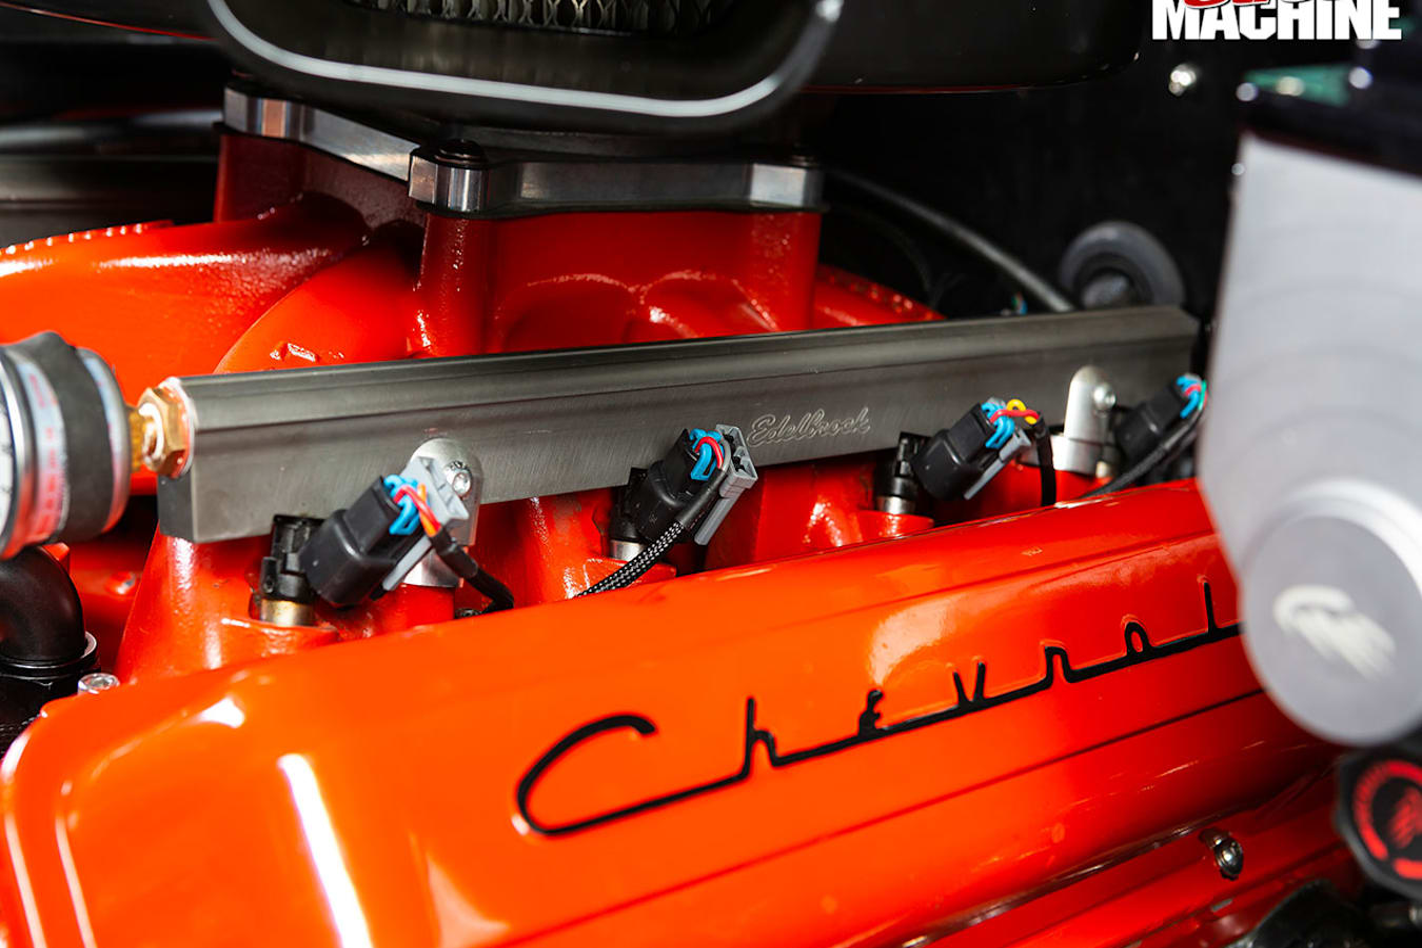 Chev C10 engine